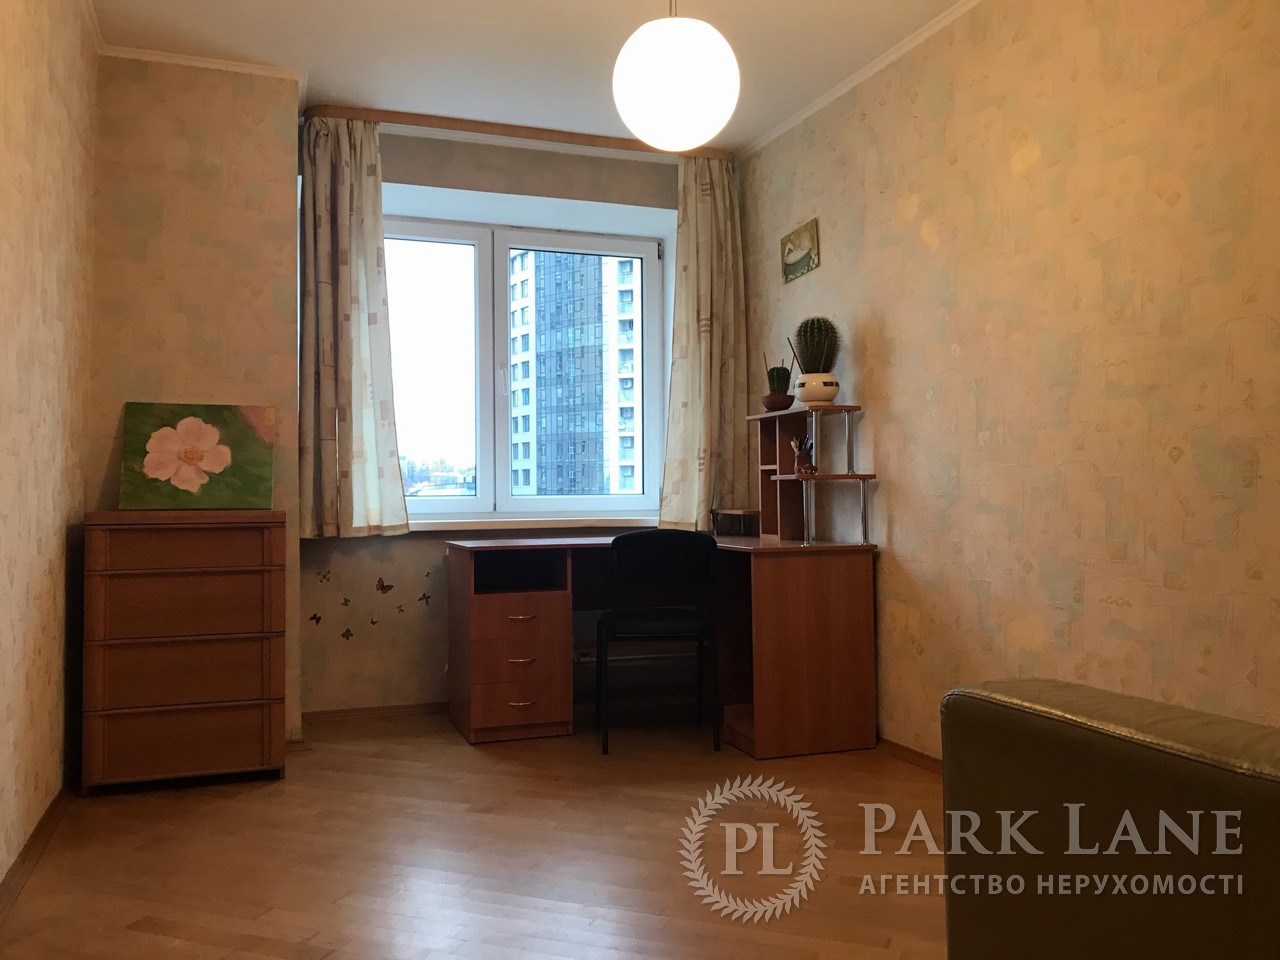 Квартира ул. Зверинецкая, 61а, Киев, R-35421 - Фото 10